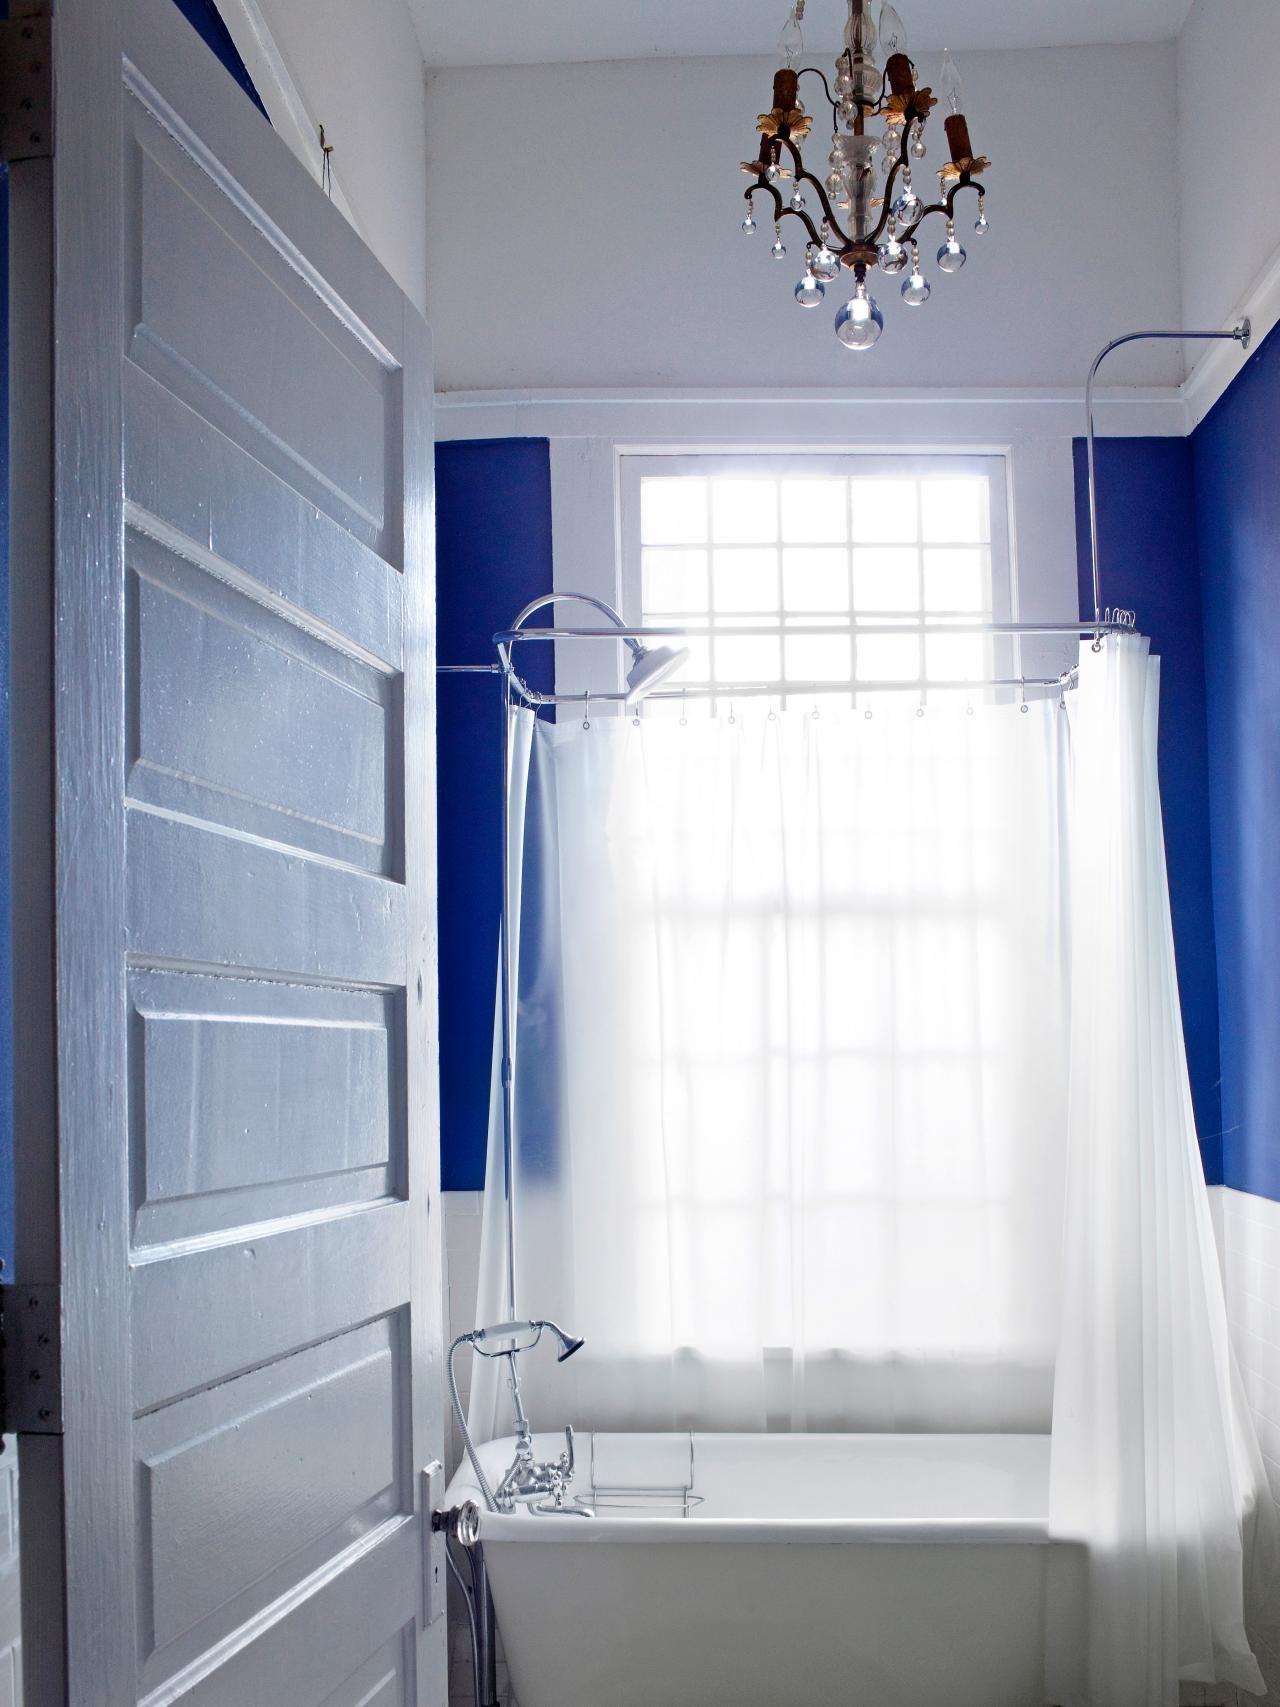 10 Big Ideas for Small Bathrooms | Cobalt blue, Small bathroom and ...